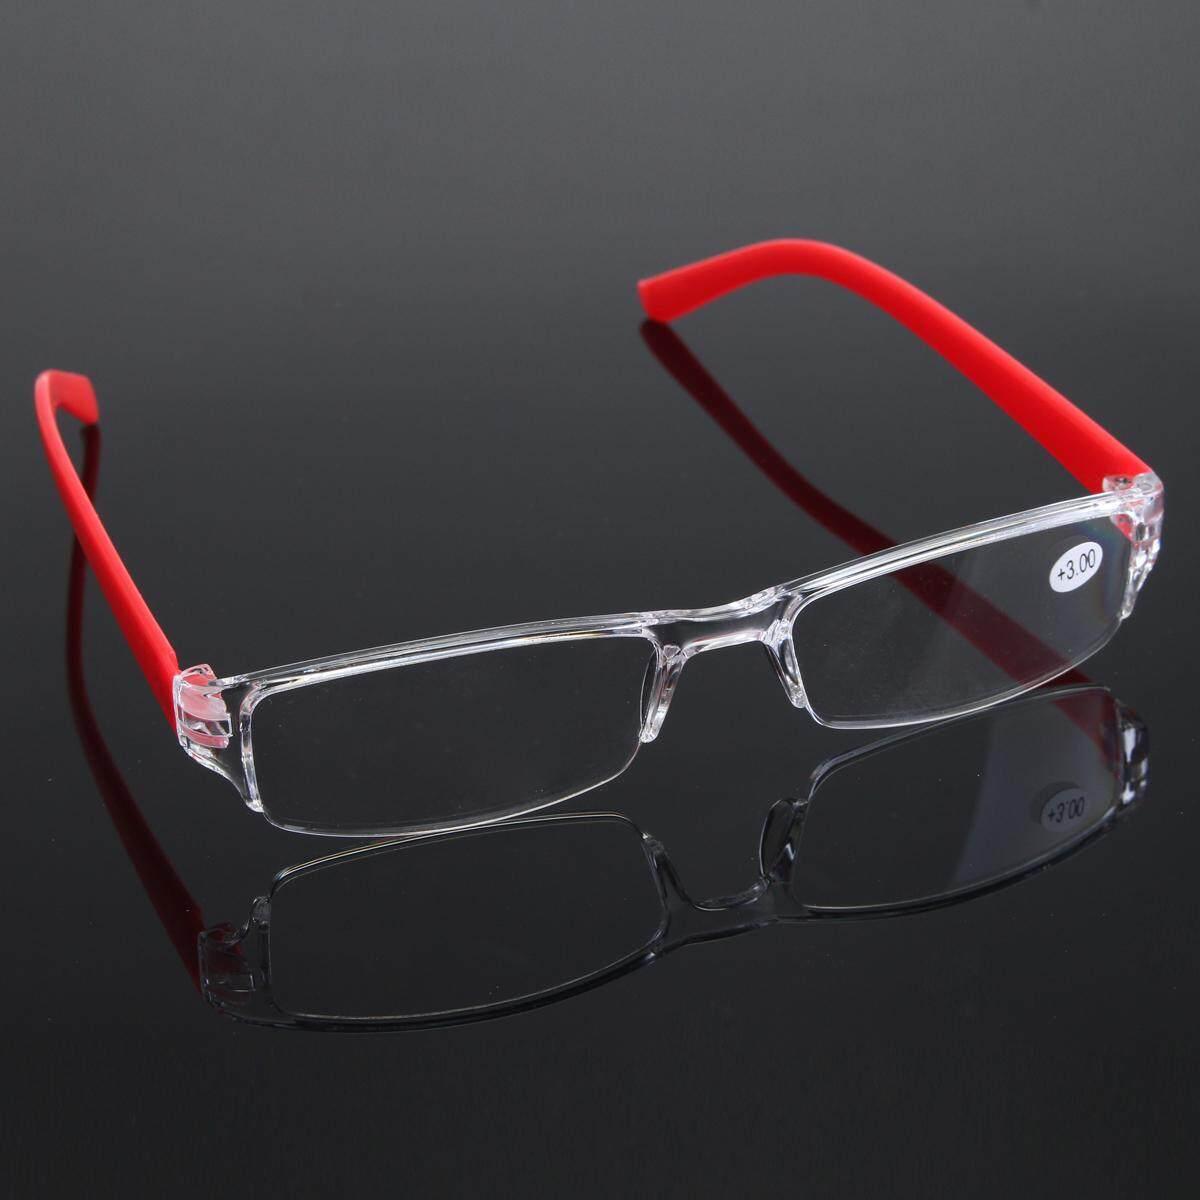 Berbobot Ringan Merah Tanpa Bingkai Resin Kaca Pembesar Baca Kacamata Kelelahan Meringankan Kekuatan 3.0-Intl